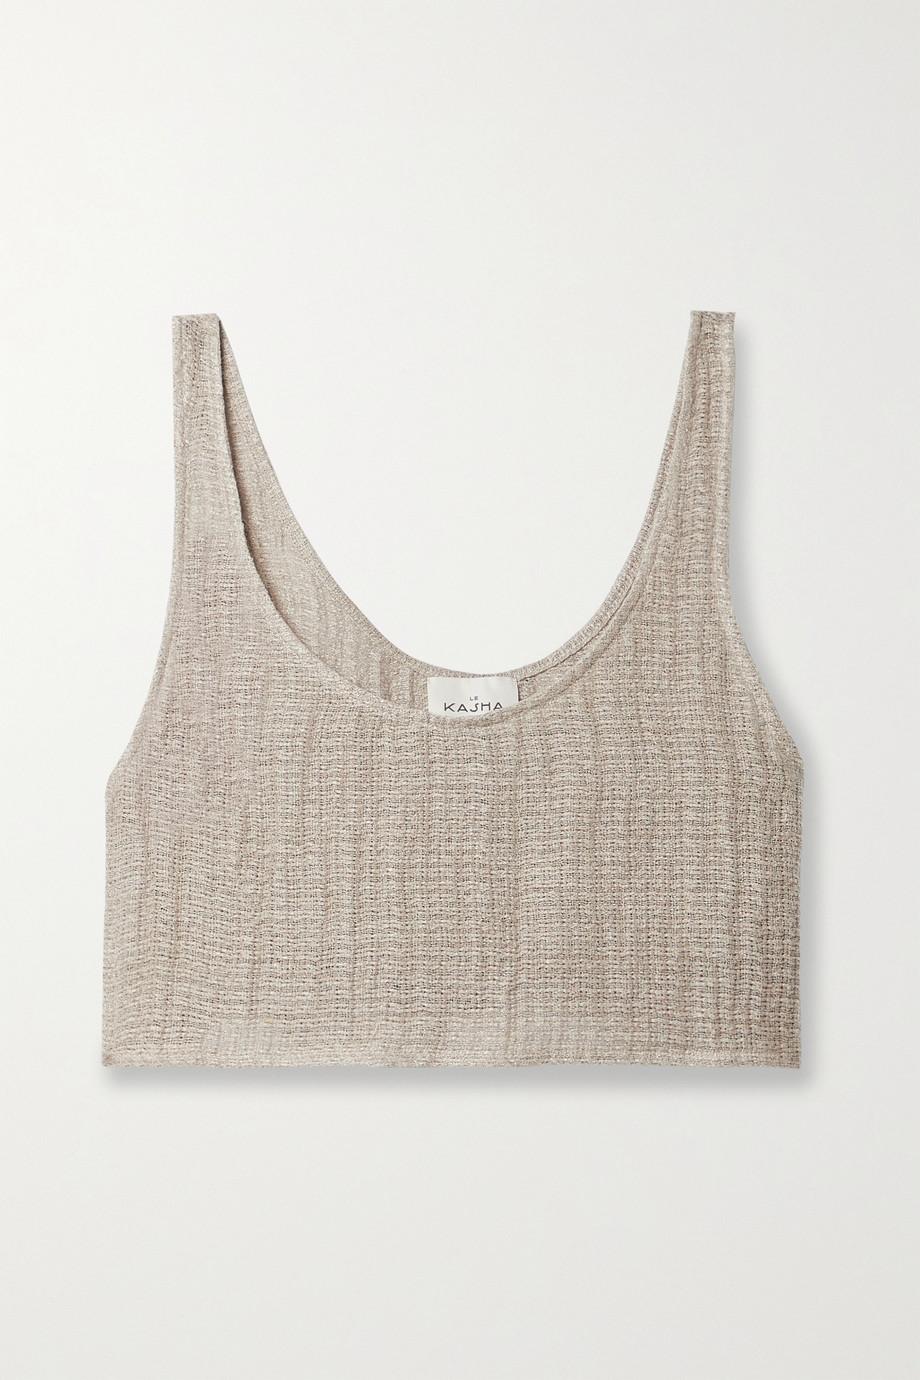 Le Kasha + NET SUSTAIN Tahta cropped organic linen-gauze top